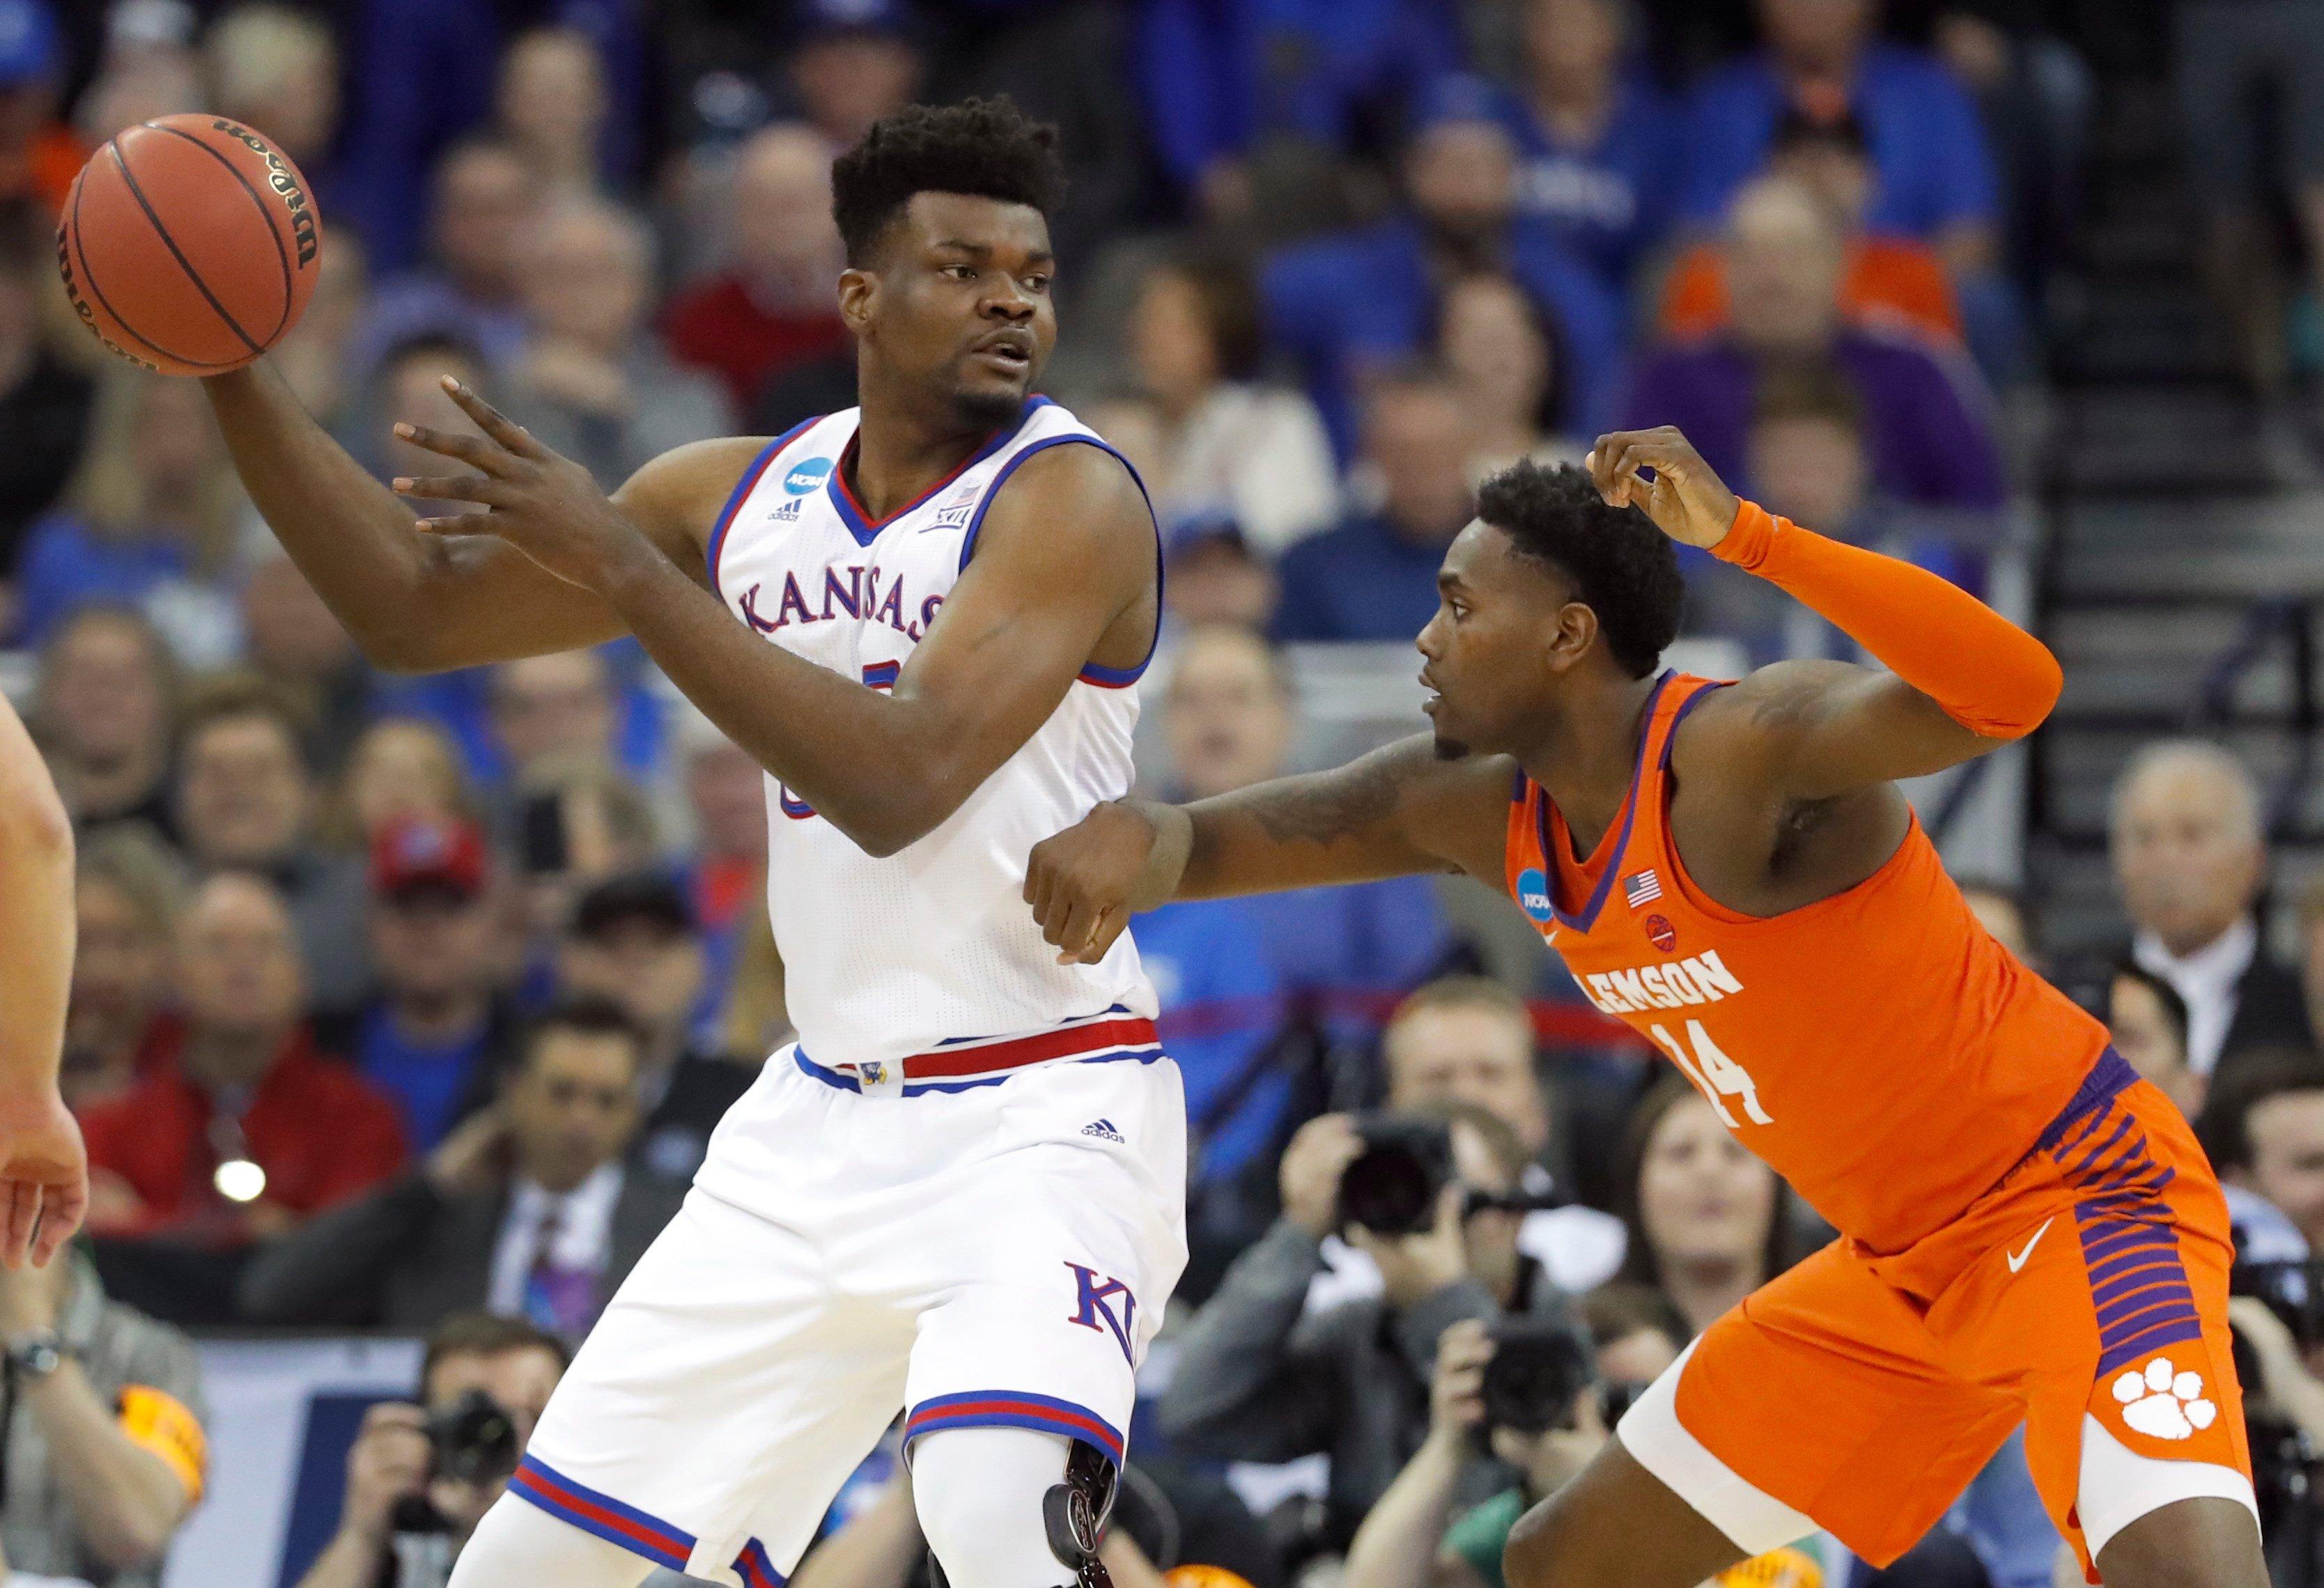 Kansas Basketball: Jayhawks are the clear favorite